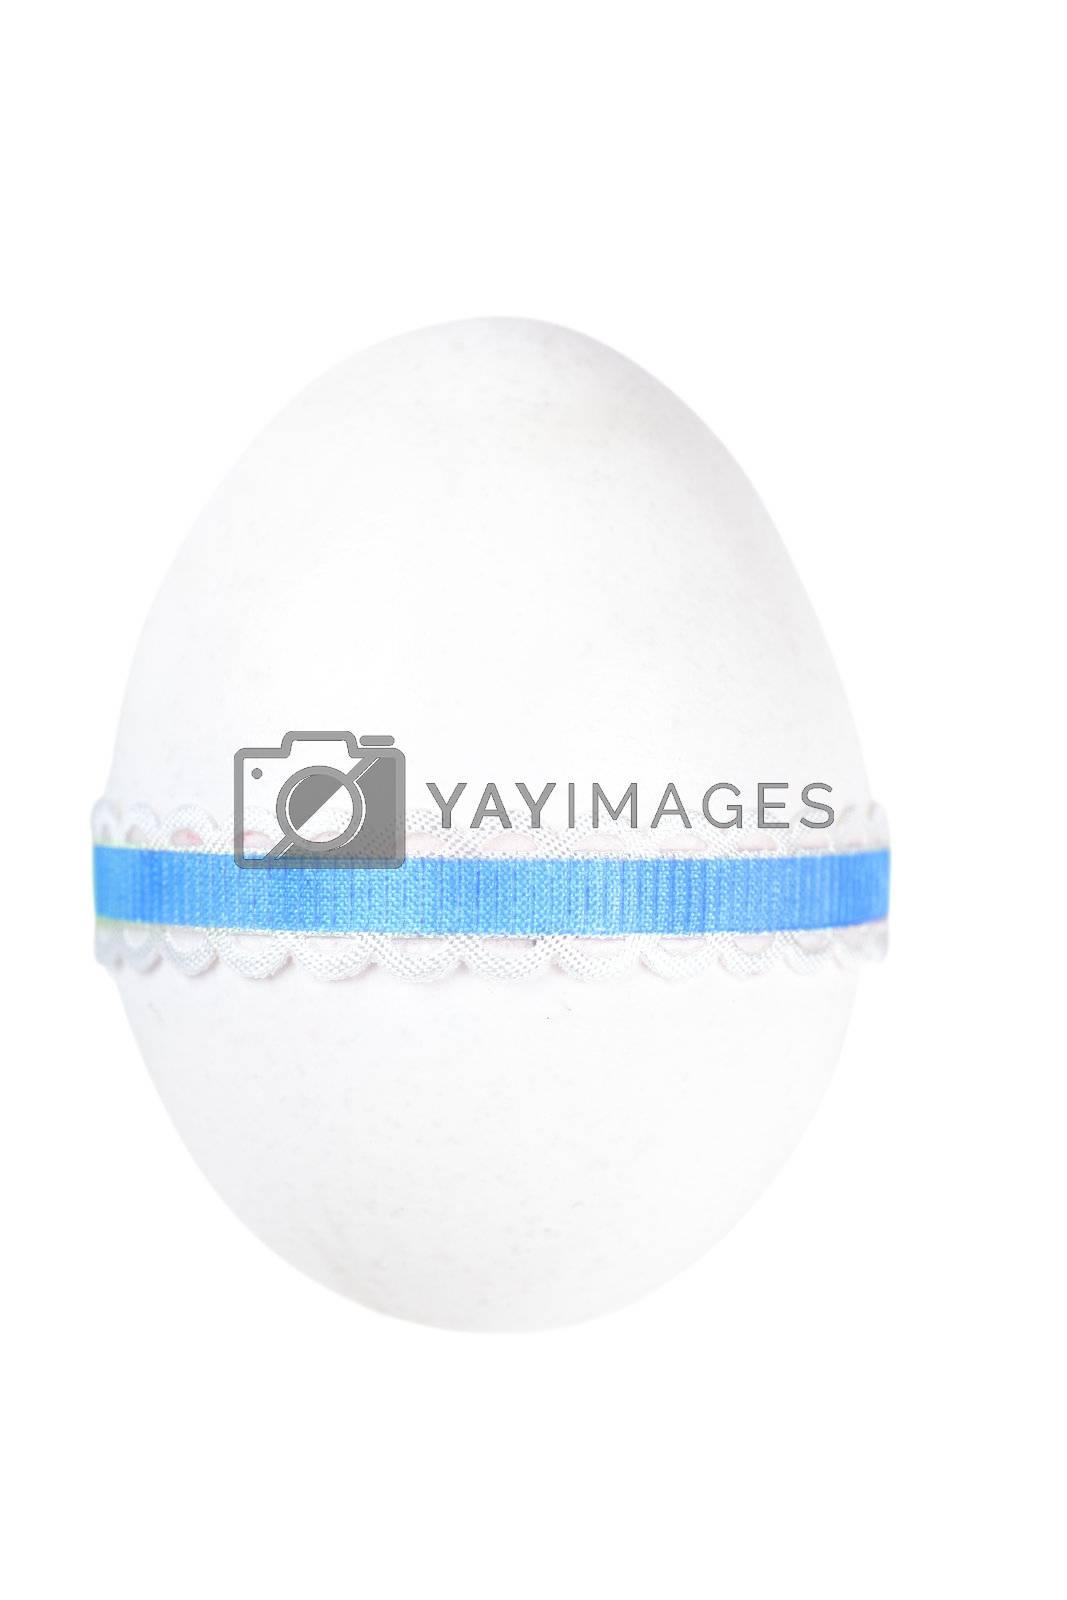 Single decorated egg isolated over white background